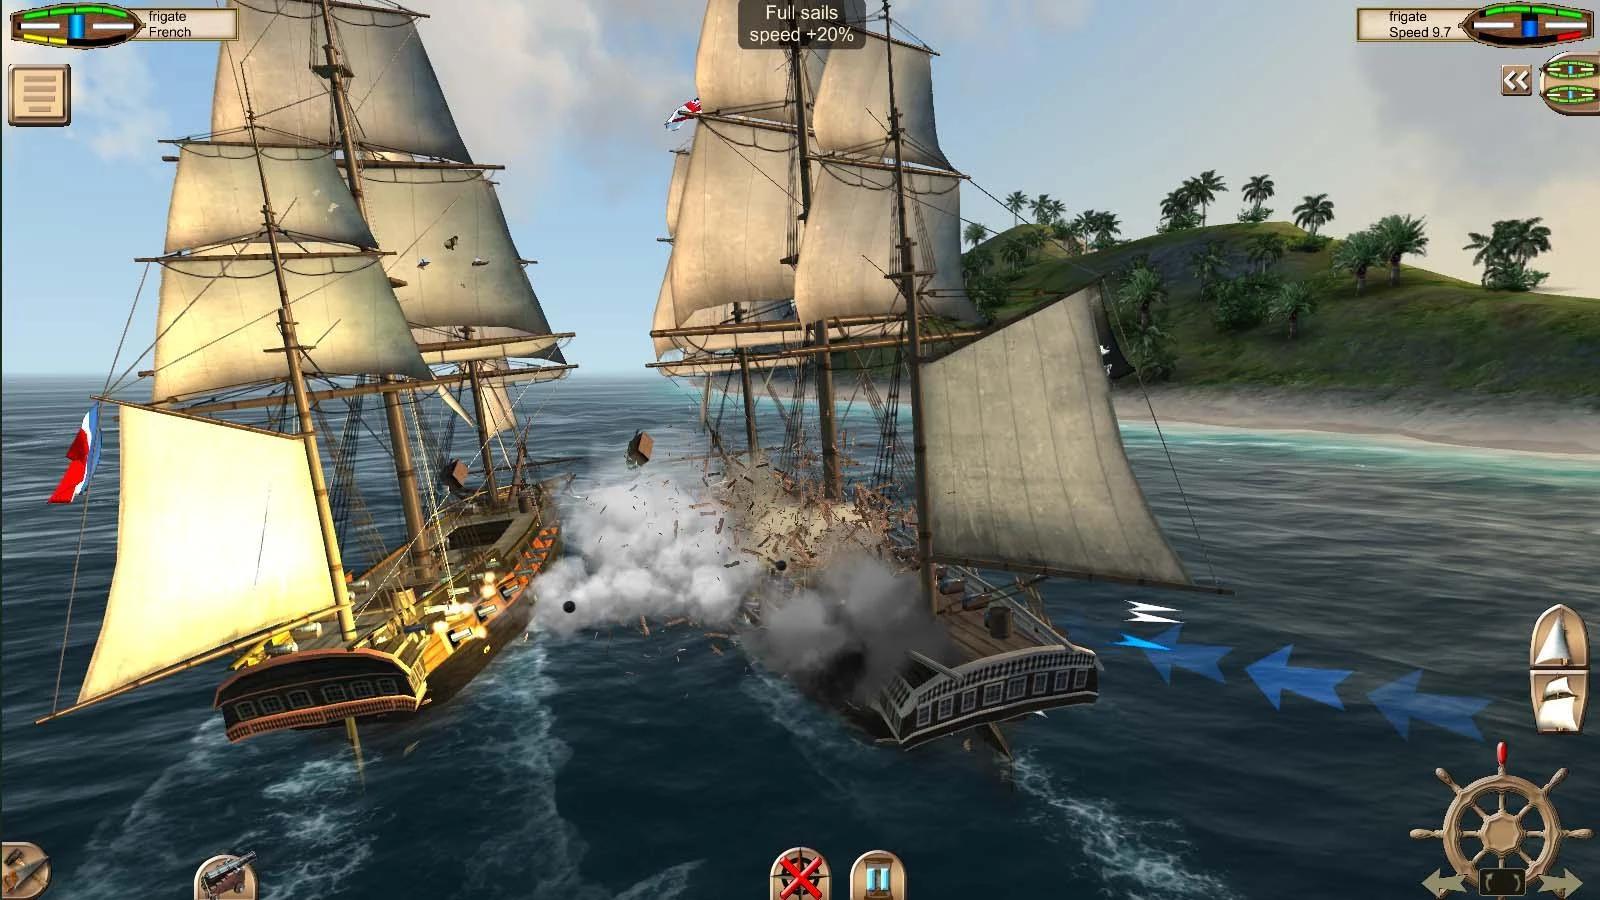 Spiele Pirate Isle - 3D - Video Slots Online